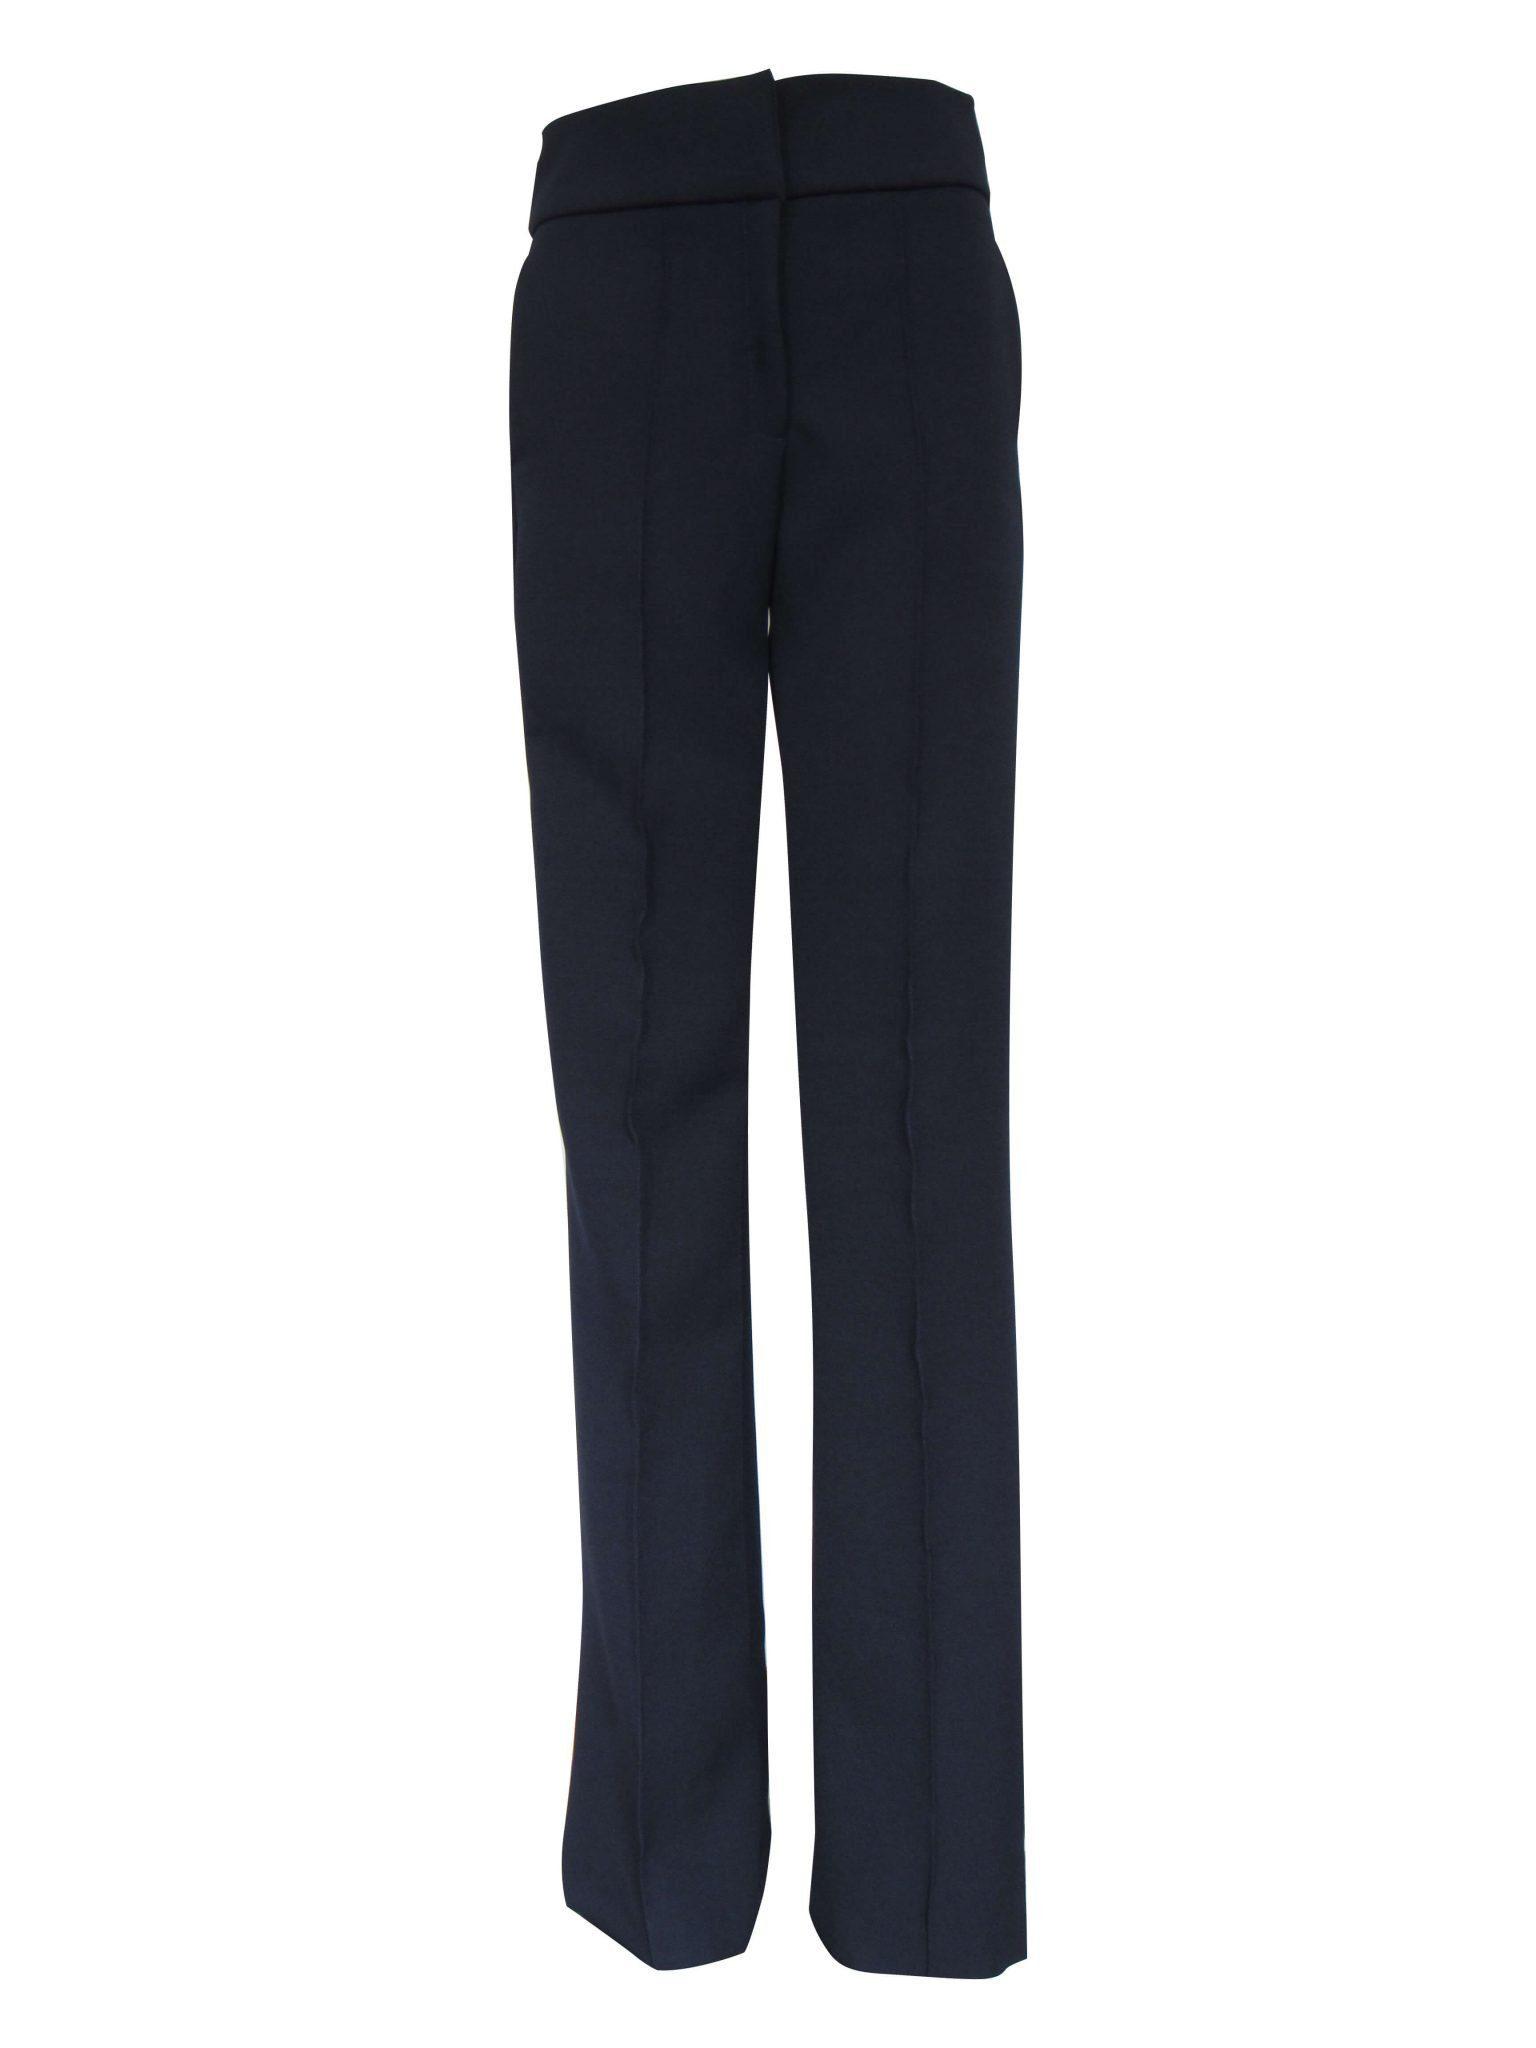 padova-pantalon-vera-navy-01